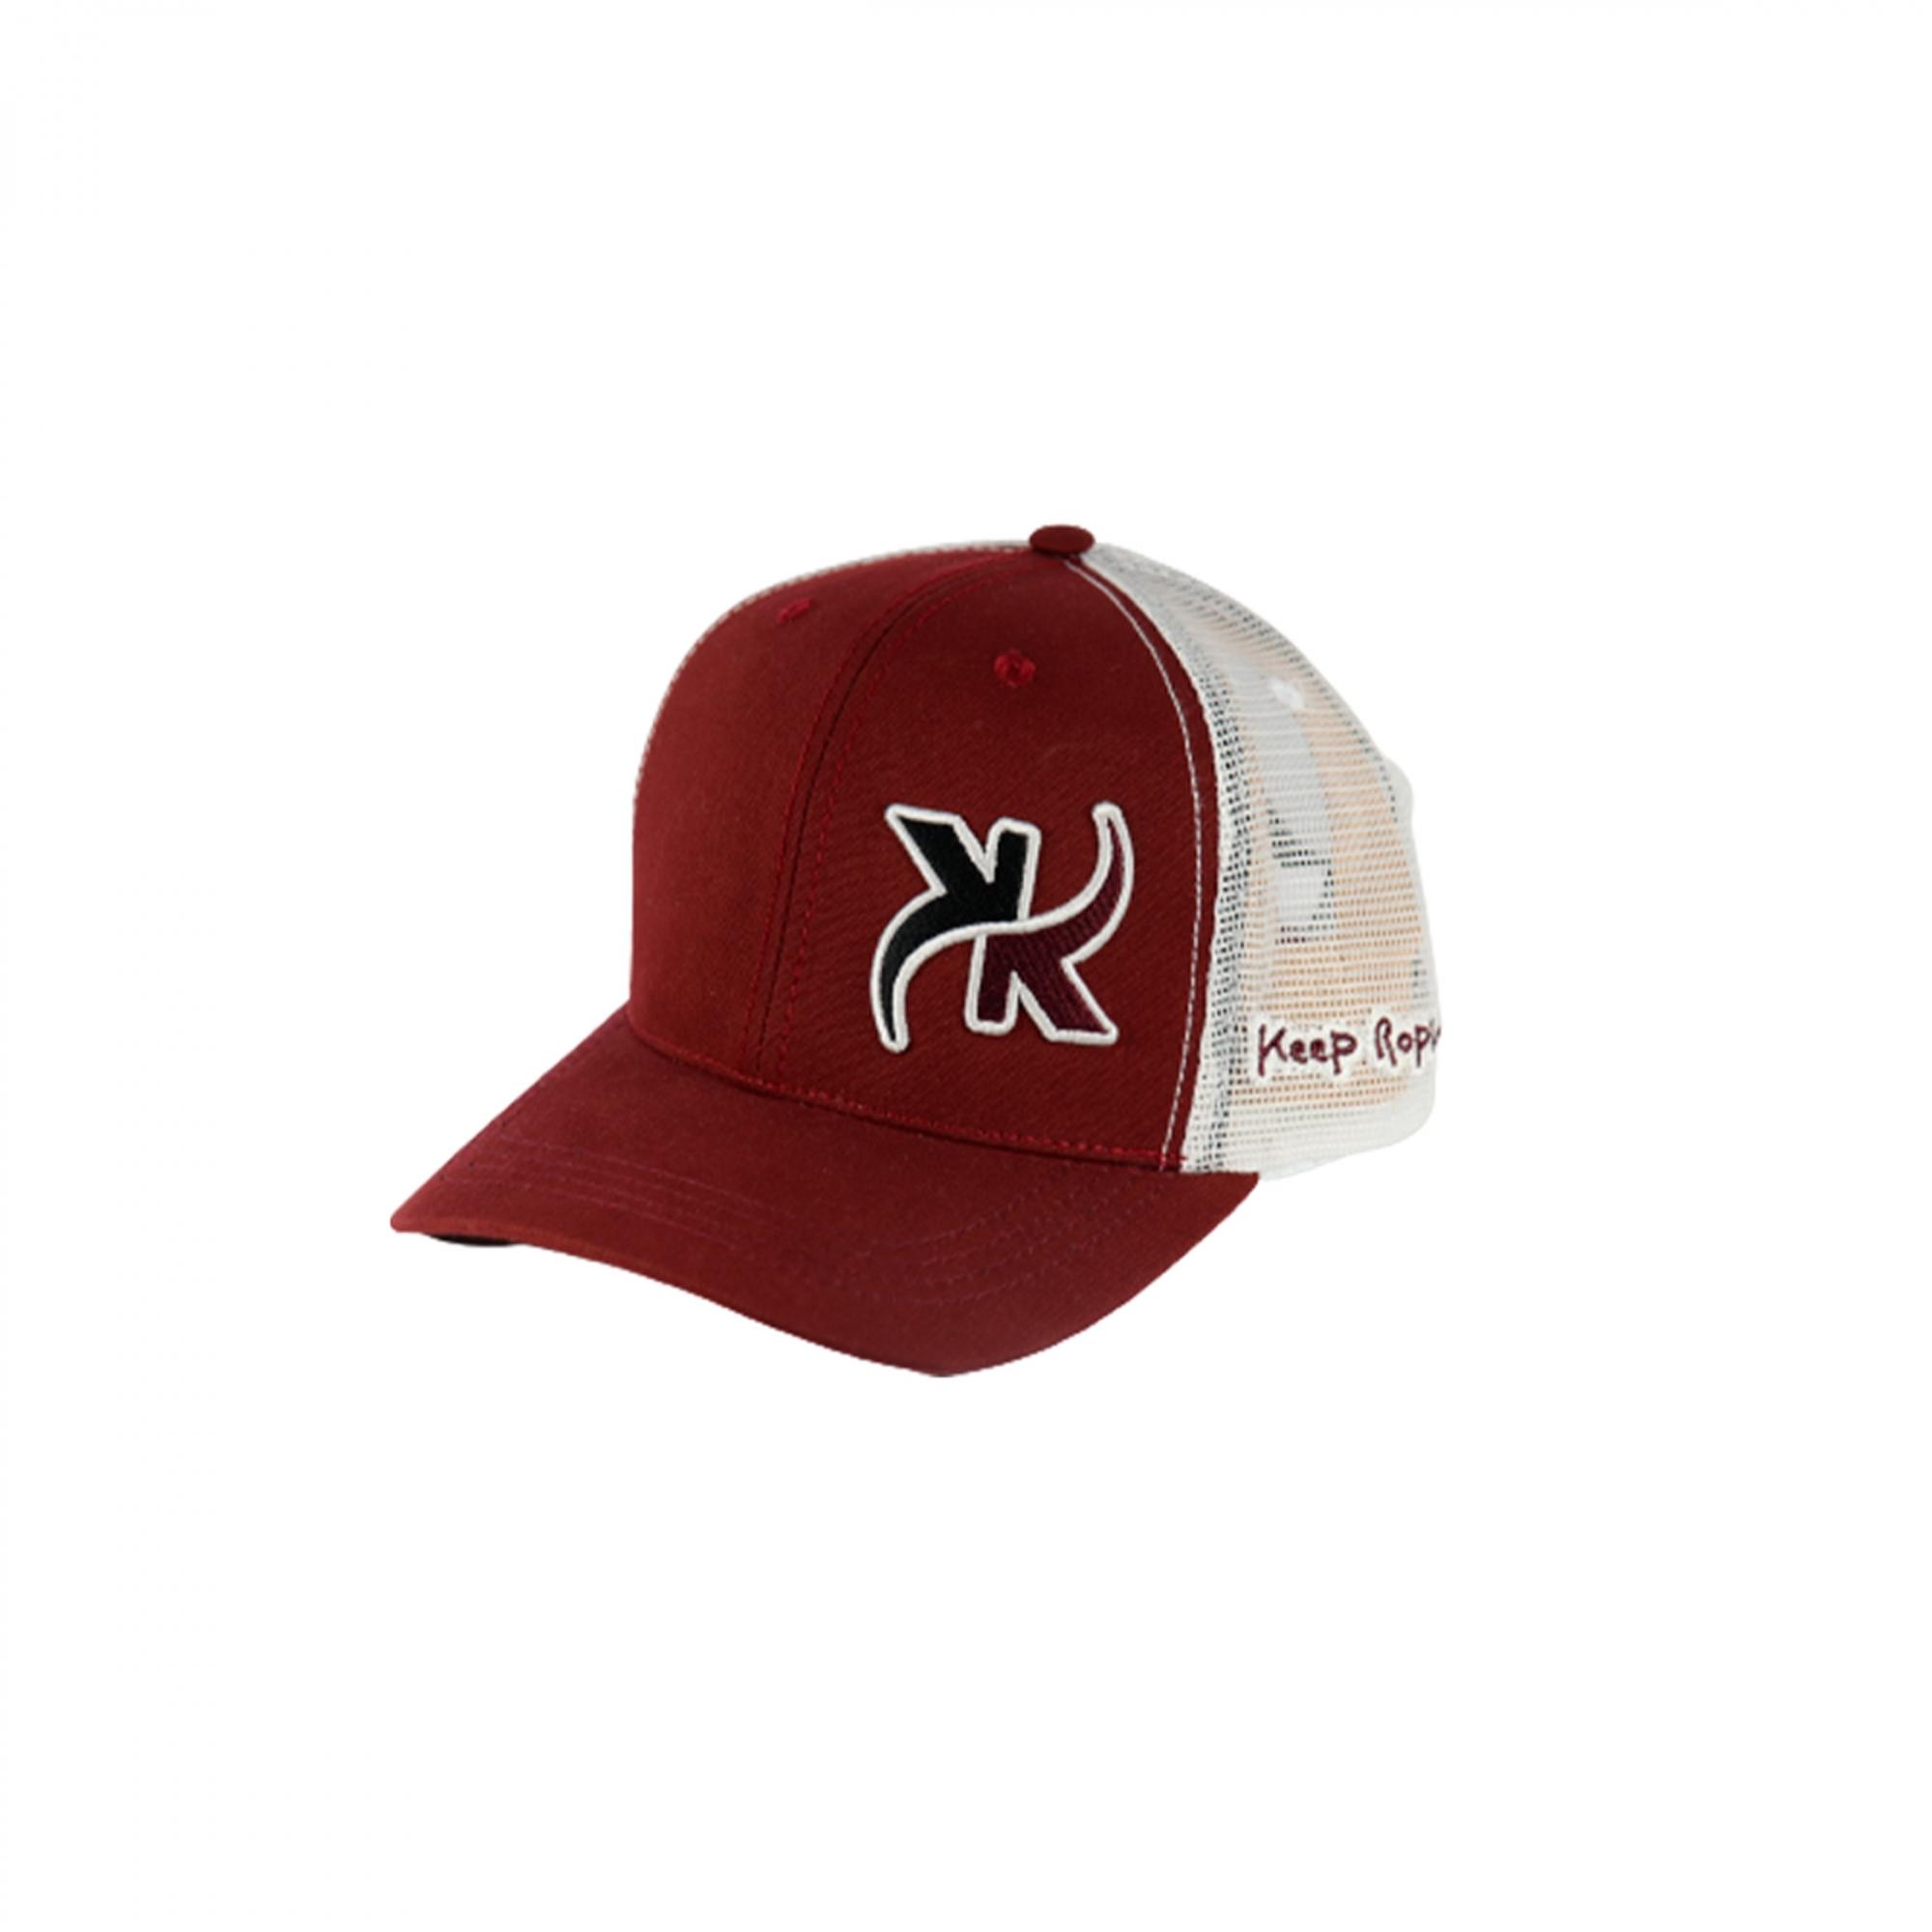 Boné Keep Roping Trucker Hat com aba curva Bordo/Branco